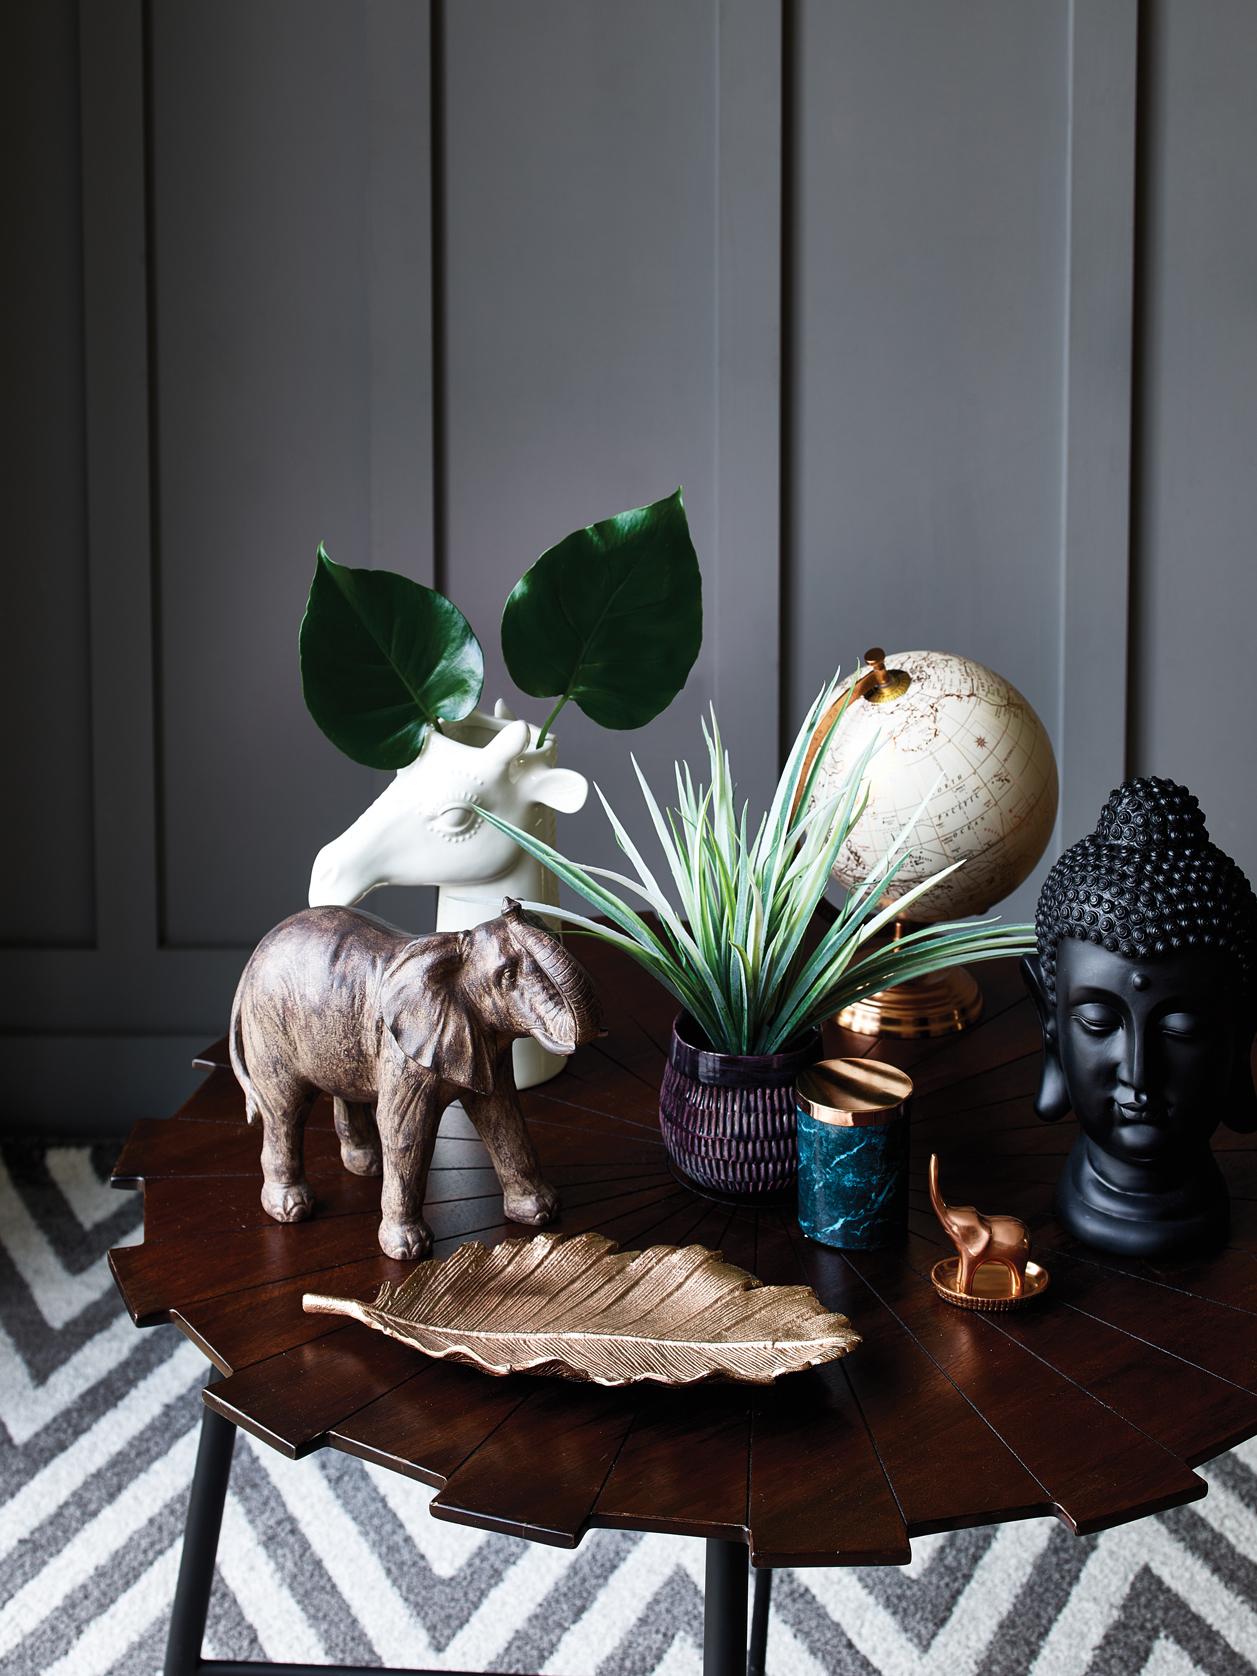 Elephant ornament - £15, Giraffe vase - £12, Copper globe - £15, Purple potted grass - £8, Marble print candle - £4, Buddha ornament - £12, Copper leaf plate - £12, Starburst coffee table - £79, Homemaker grey chevron rug - £60.